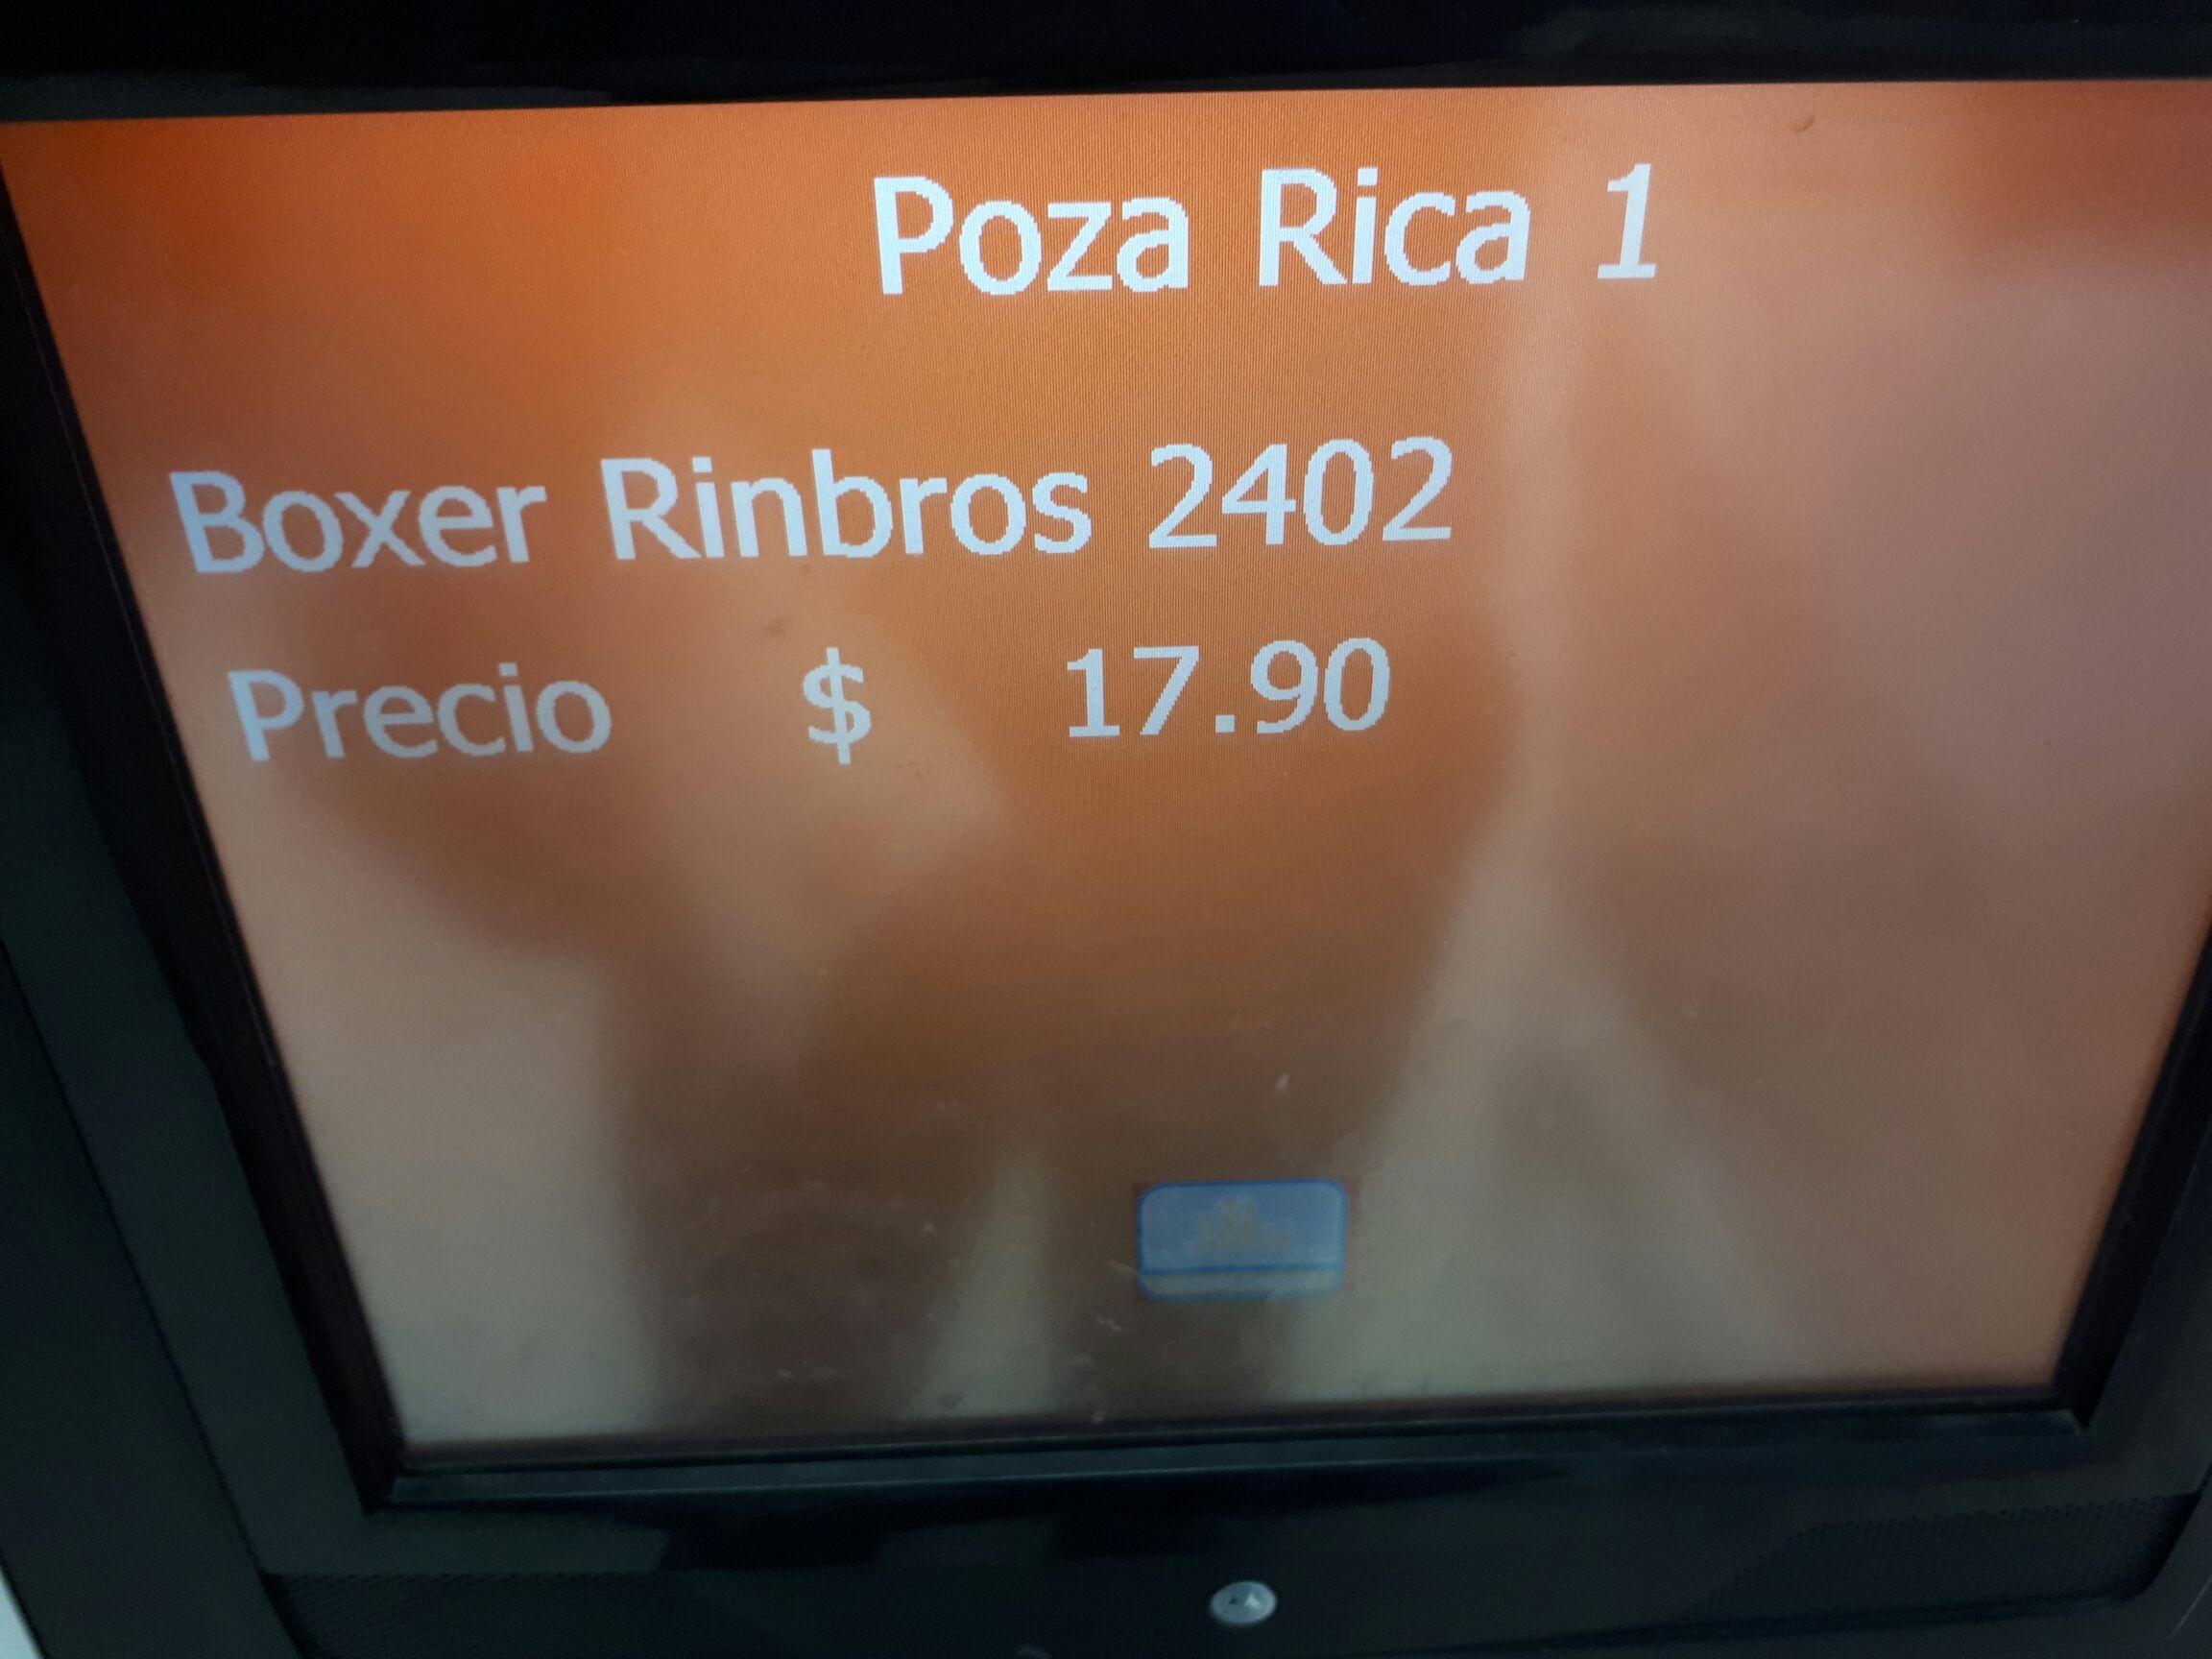 Chedraui: 4 Boxers infantiles Rinbros x $17.90.